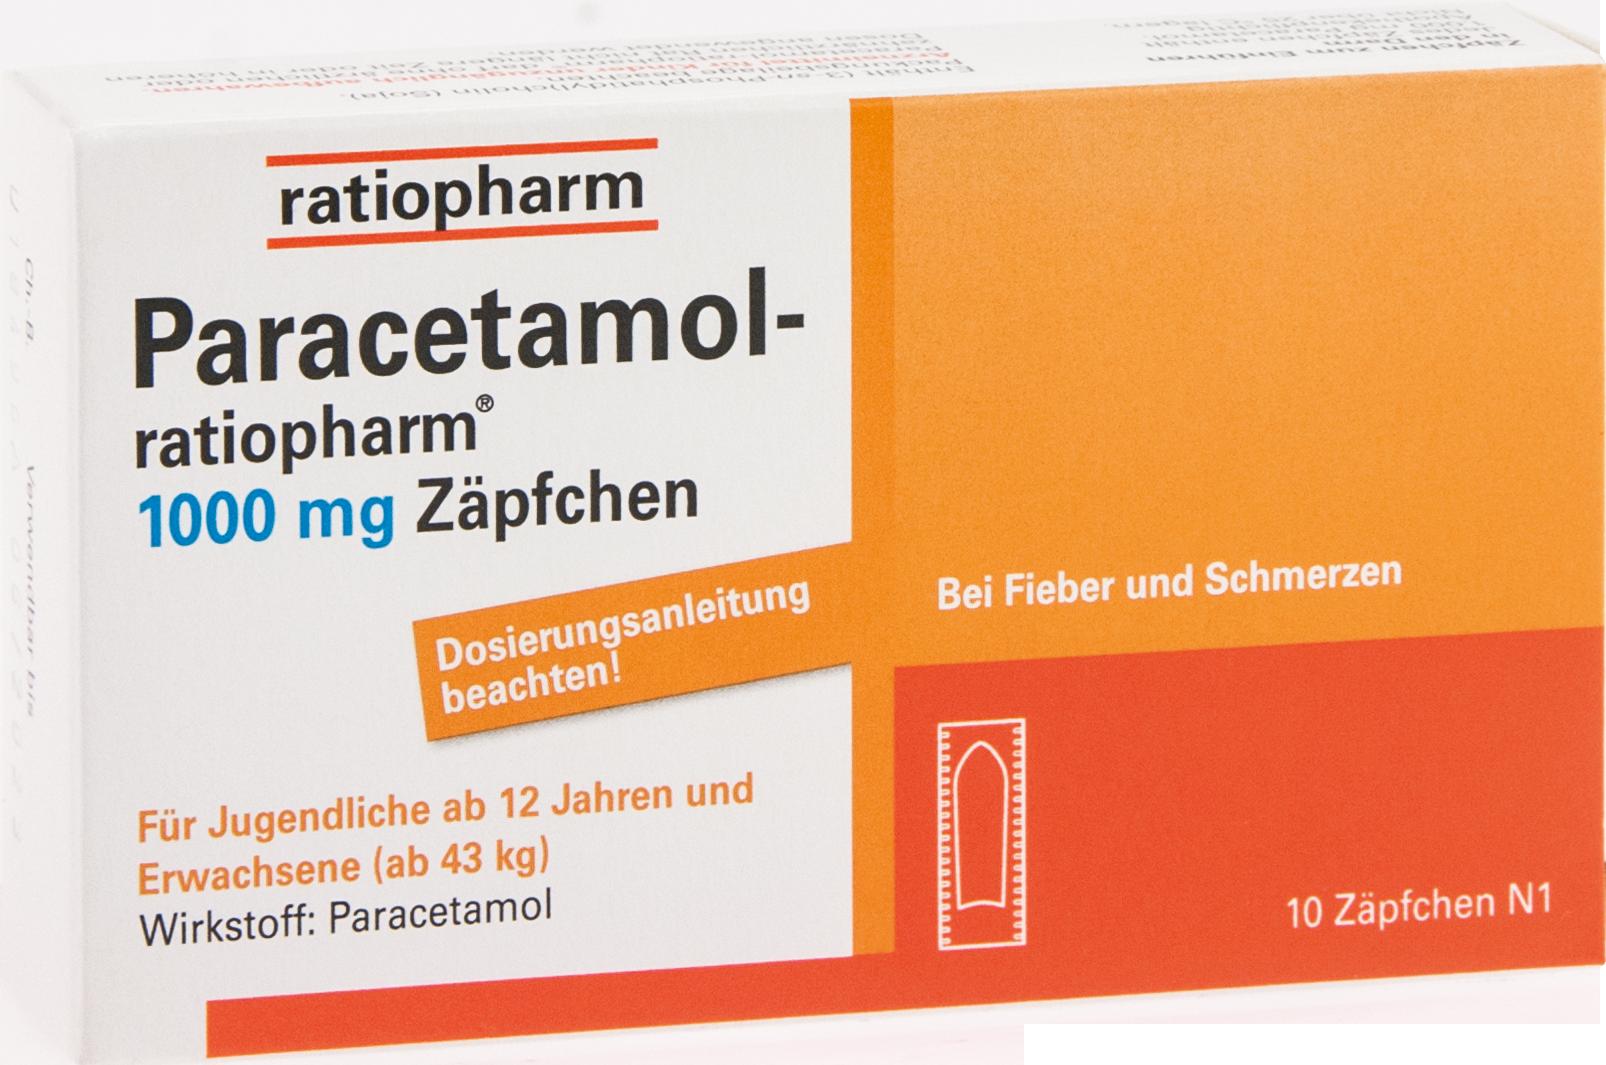 Paracetamol-ratiopharm 1000mg Zäpfchen